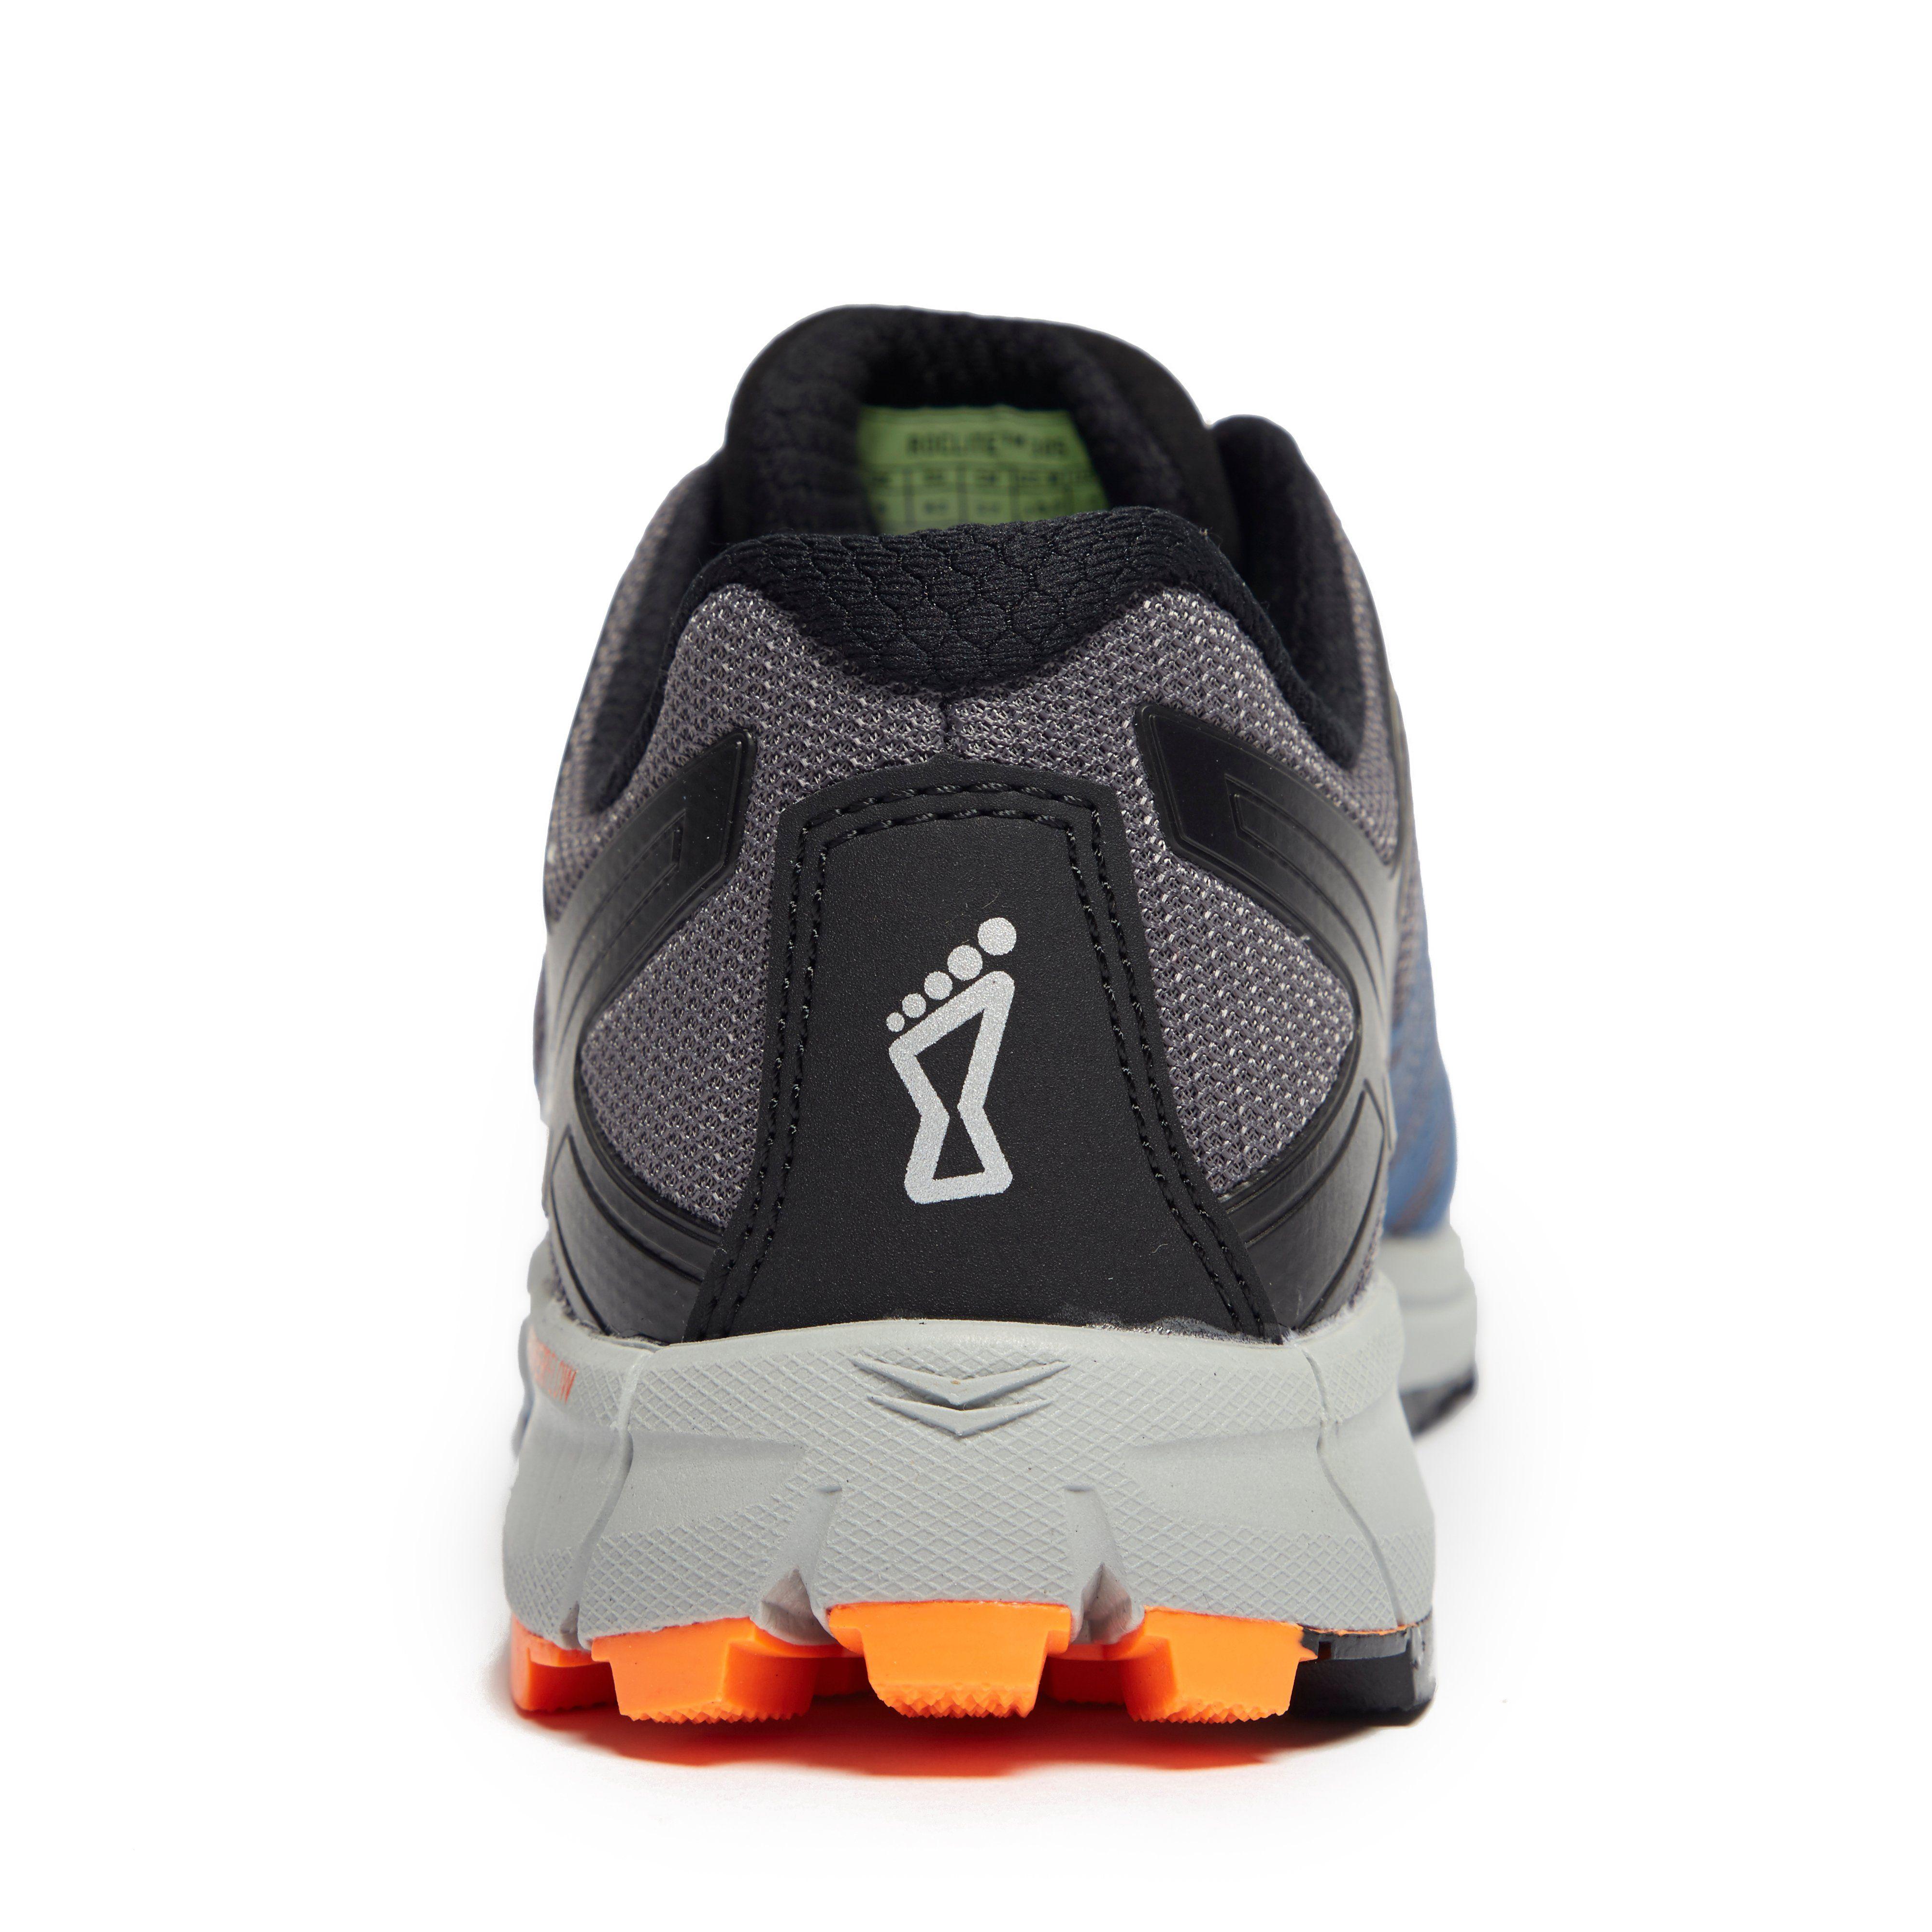 Inov-8 Roclite 305 Men's Trail Running Shoes